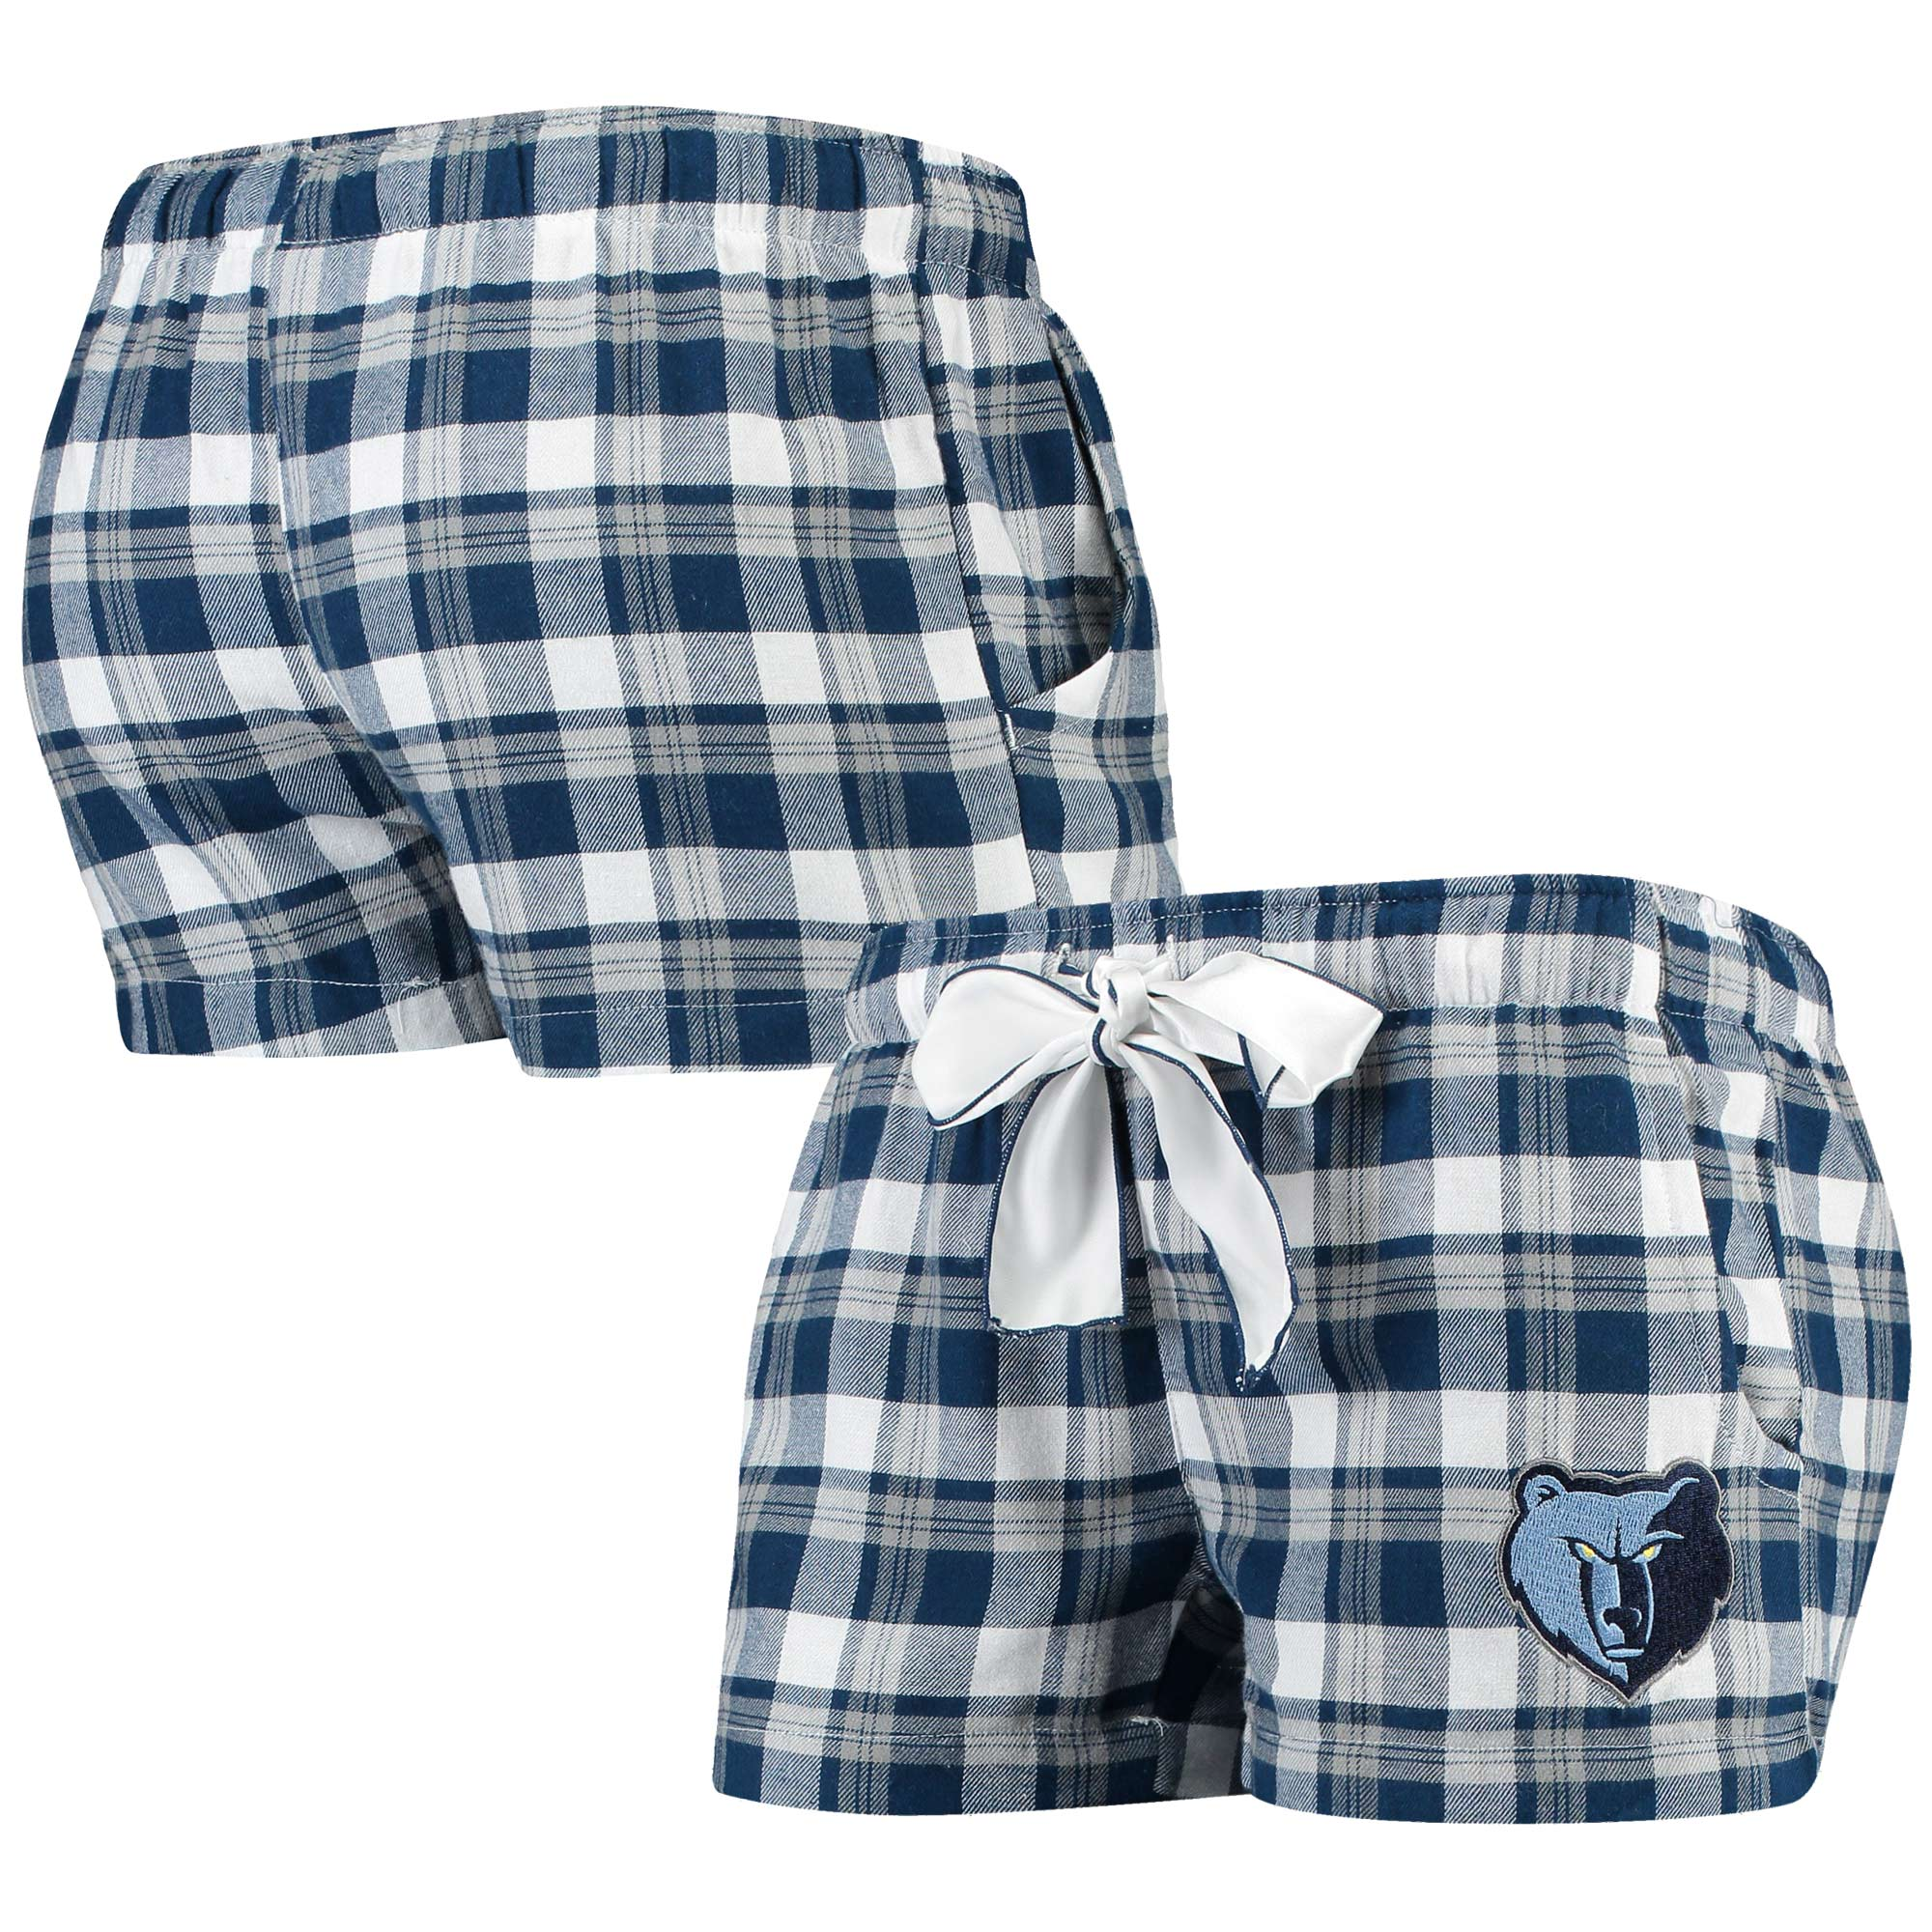 Memphis Grizzlies Concepts Sport Women's Piedmont Flannel Sleep Shorts - Navy/Gray